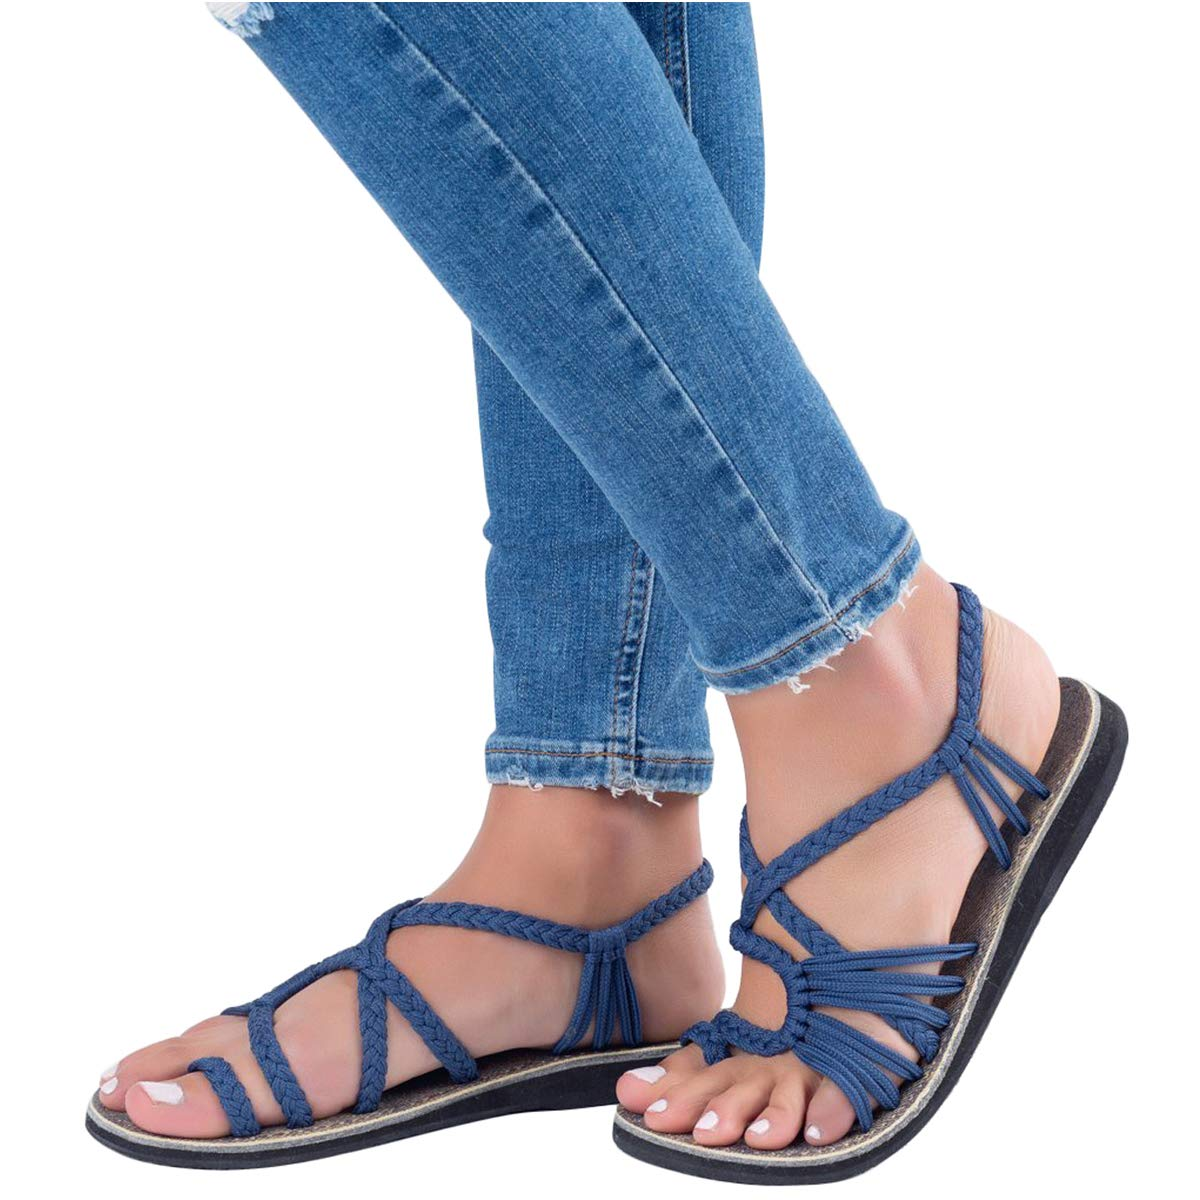 Sandales Femme Tressée Sandales Femmes Chaussures B018I86A7C Herringbone de Flip Plage Plats Bohême Clip Toe Herringbone Flip Flops Bleu 63aedf8 - reprogrammed.space